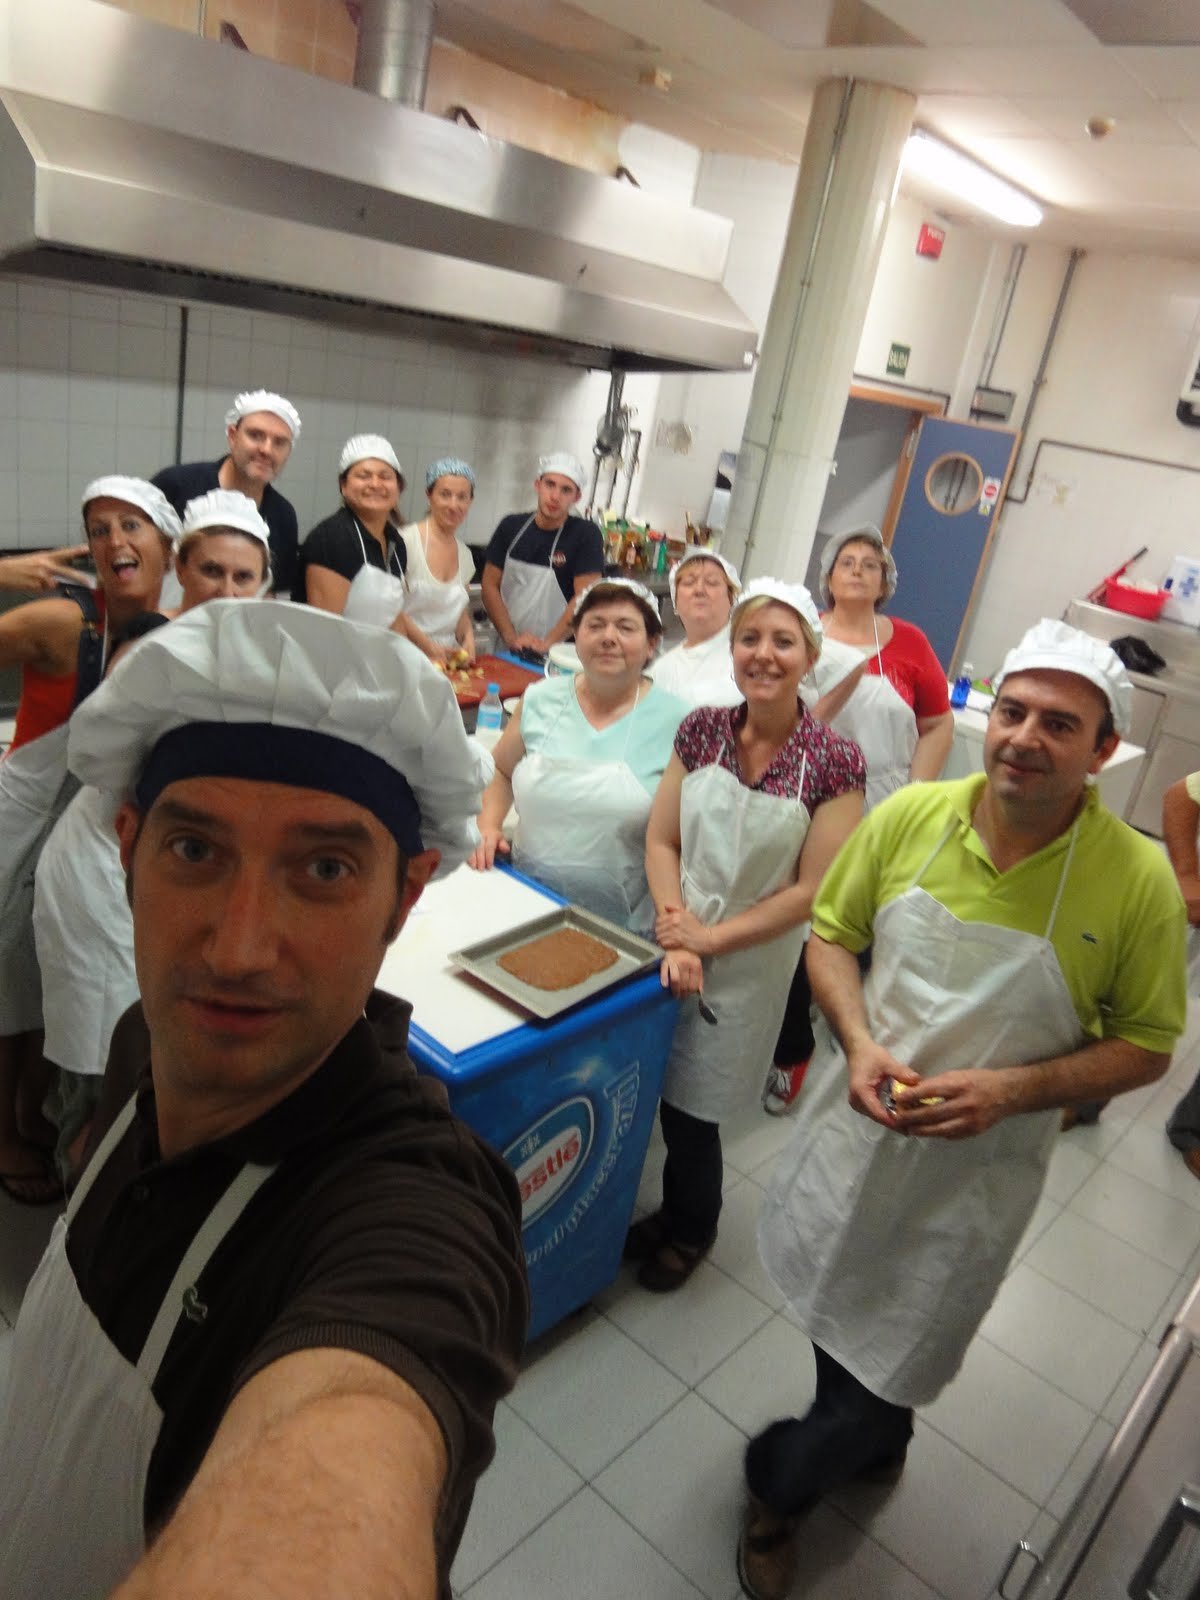 Clases de cocina zaragoza fin del curso de cocina - Cursos de cocina zaragoza ...